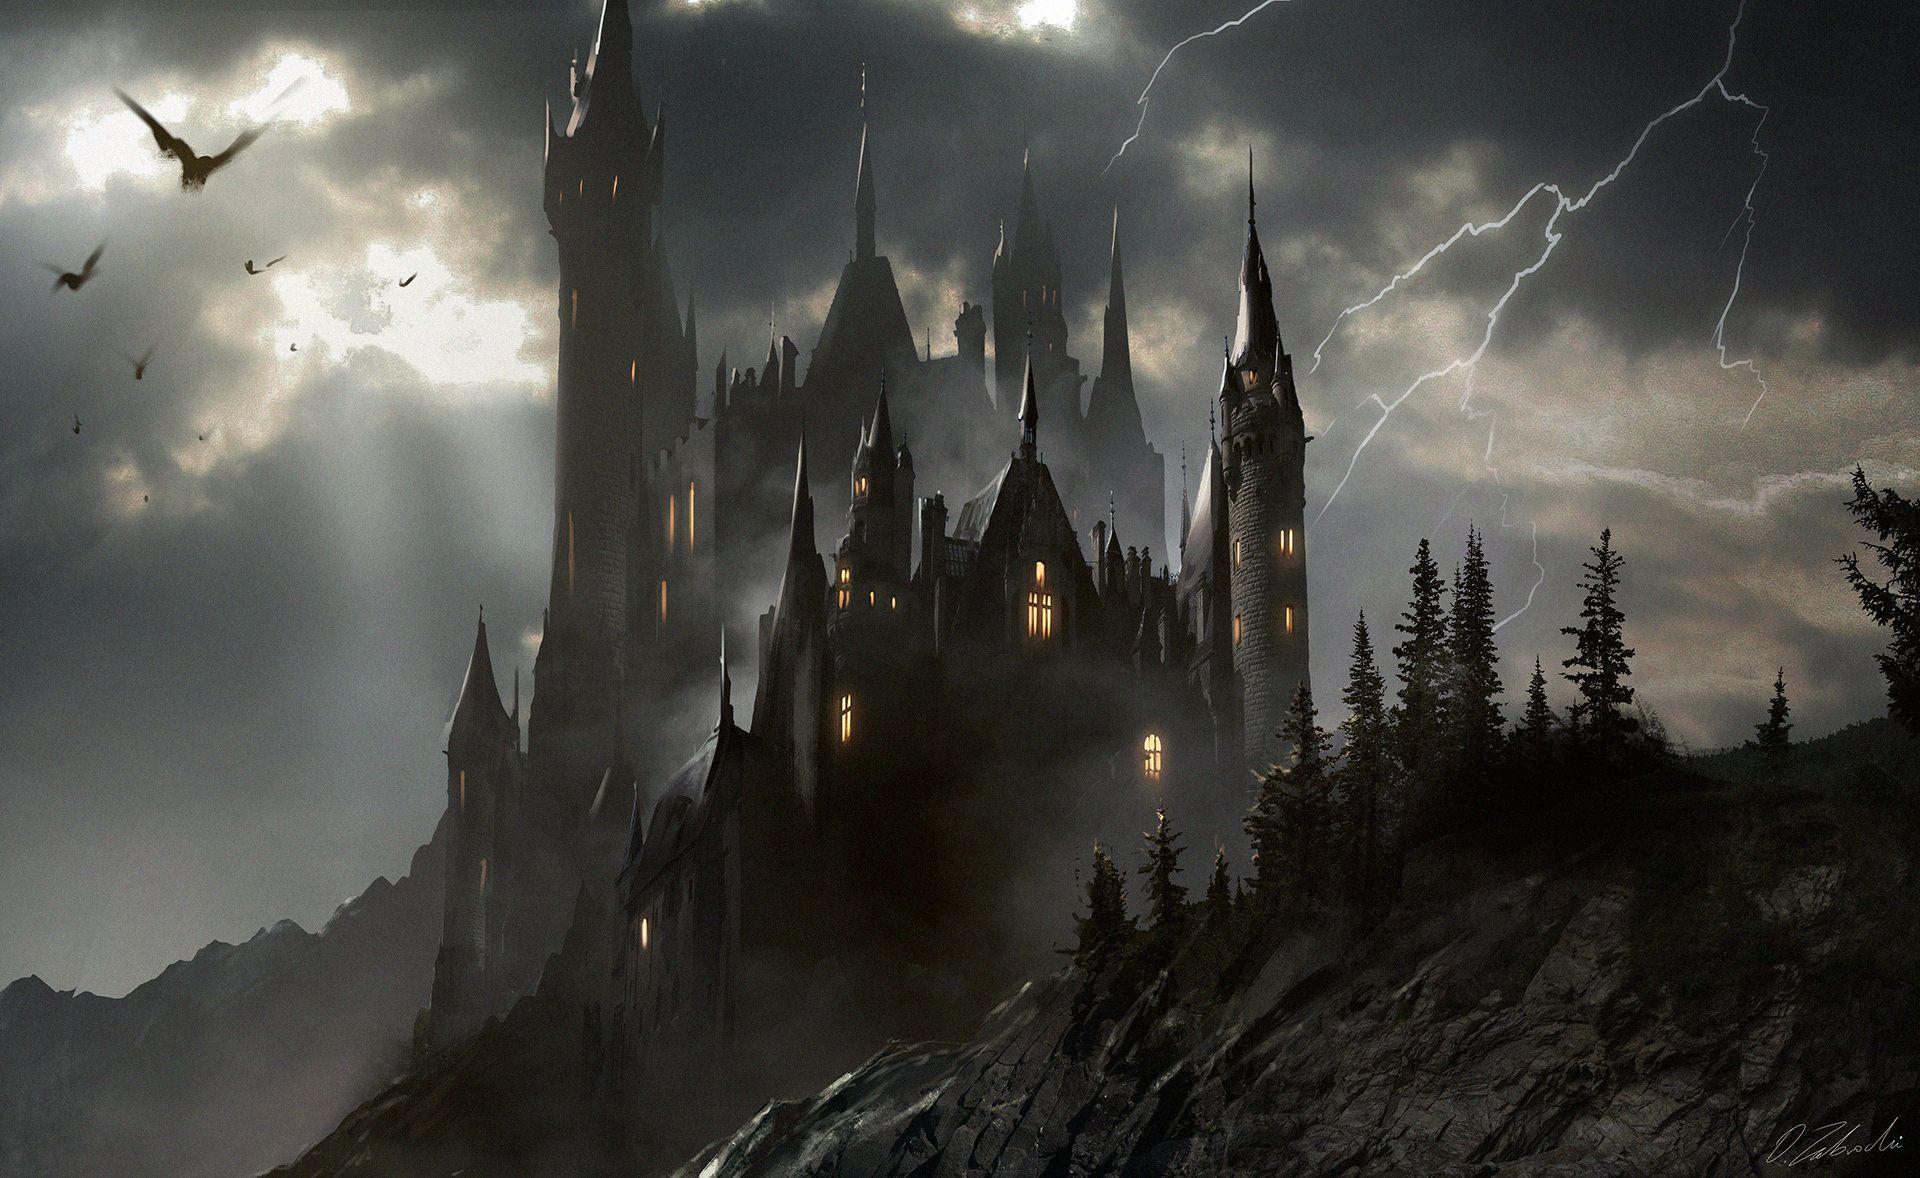 darek-zabrocki-castle-transylvania.jpg (JPEG Image, 1920×1178 pixels) - Scaled (79%)